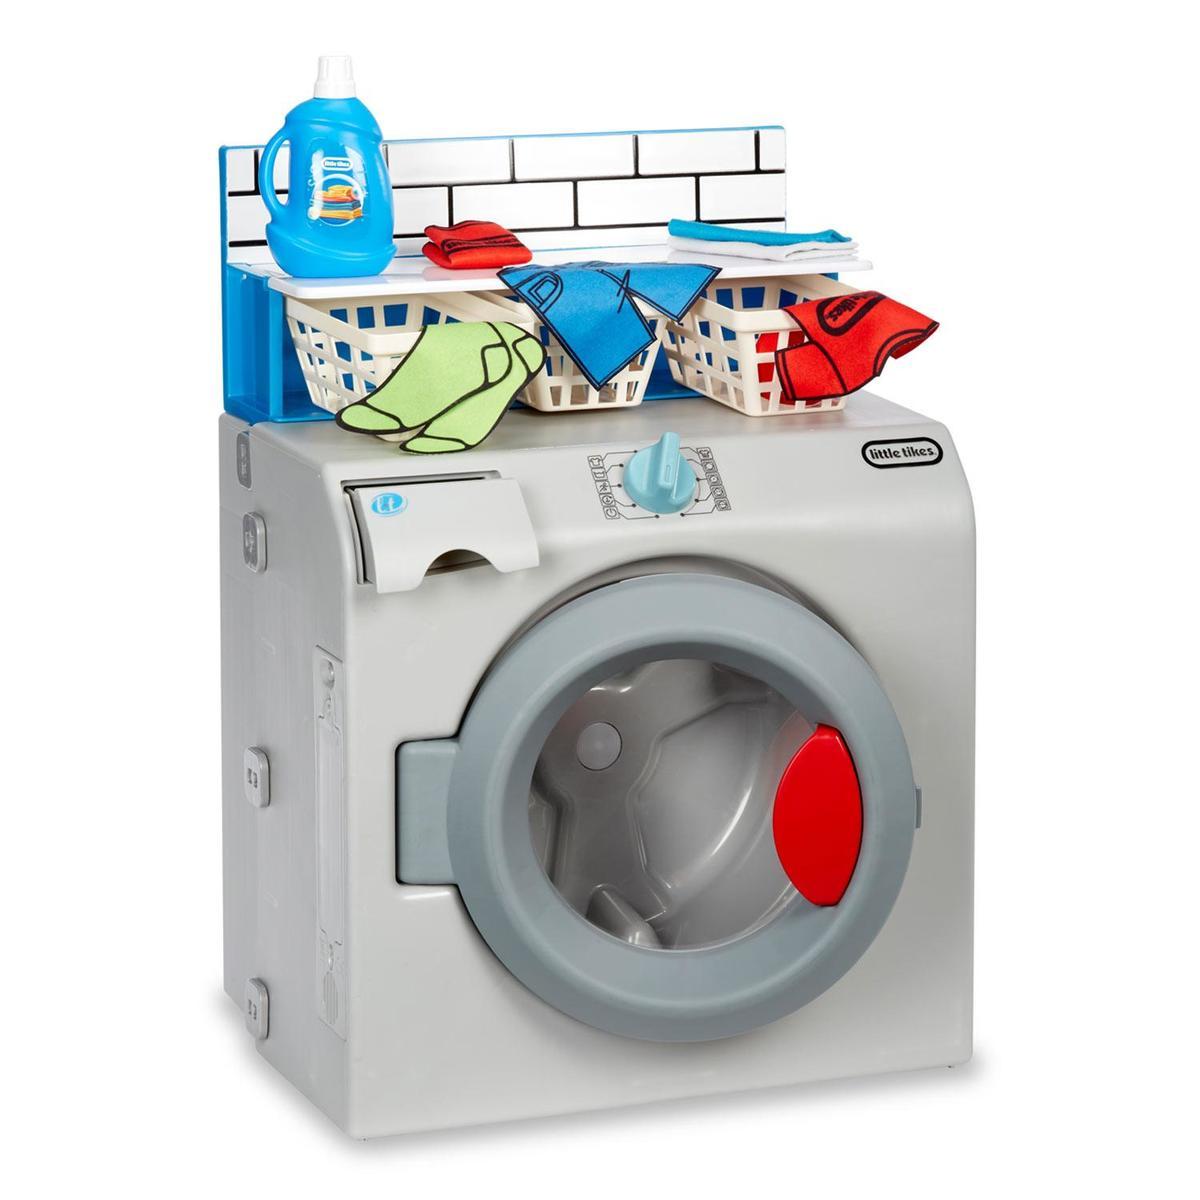 Little Tikes - First Washer-Dryer (651410)